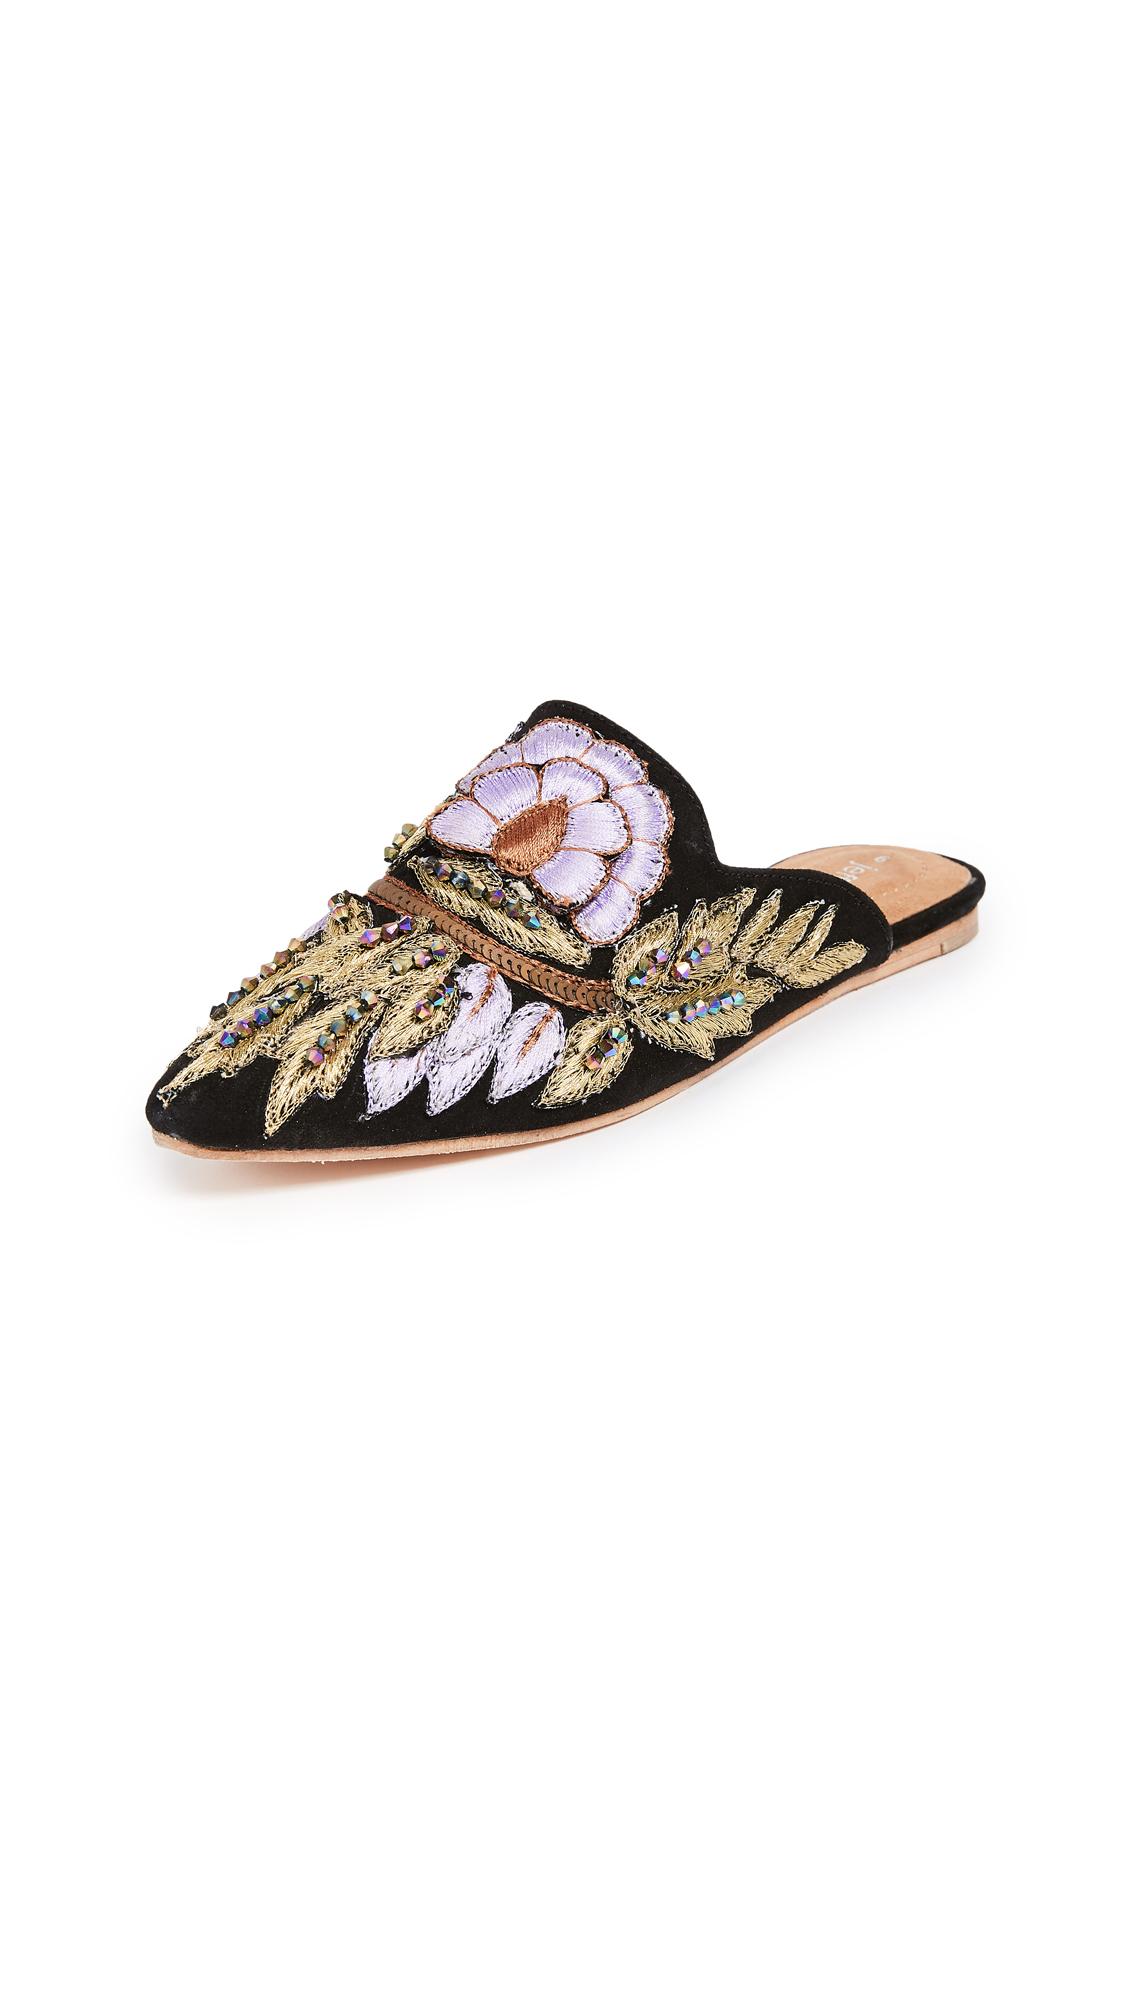 Jeffrey Campbell Varada Point Toe Slides - Black/Lilac